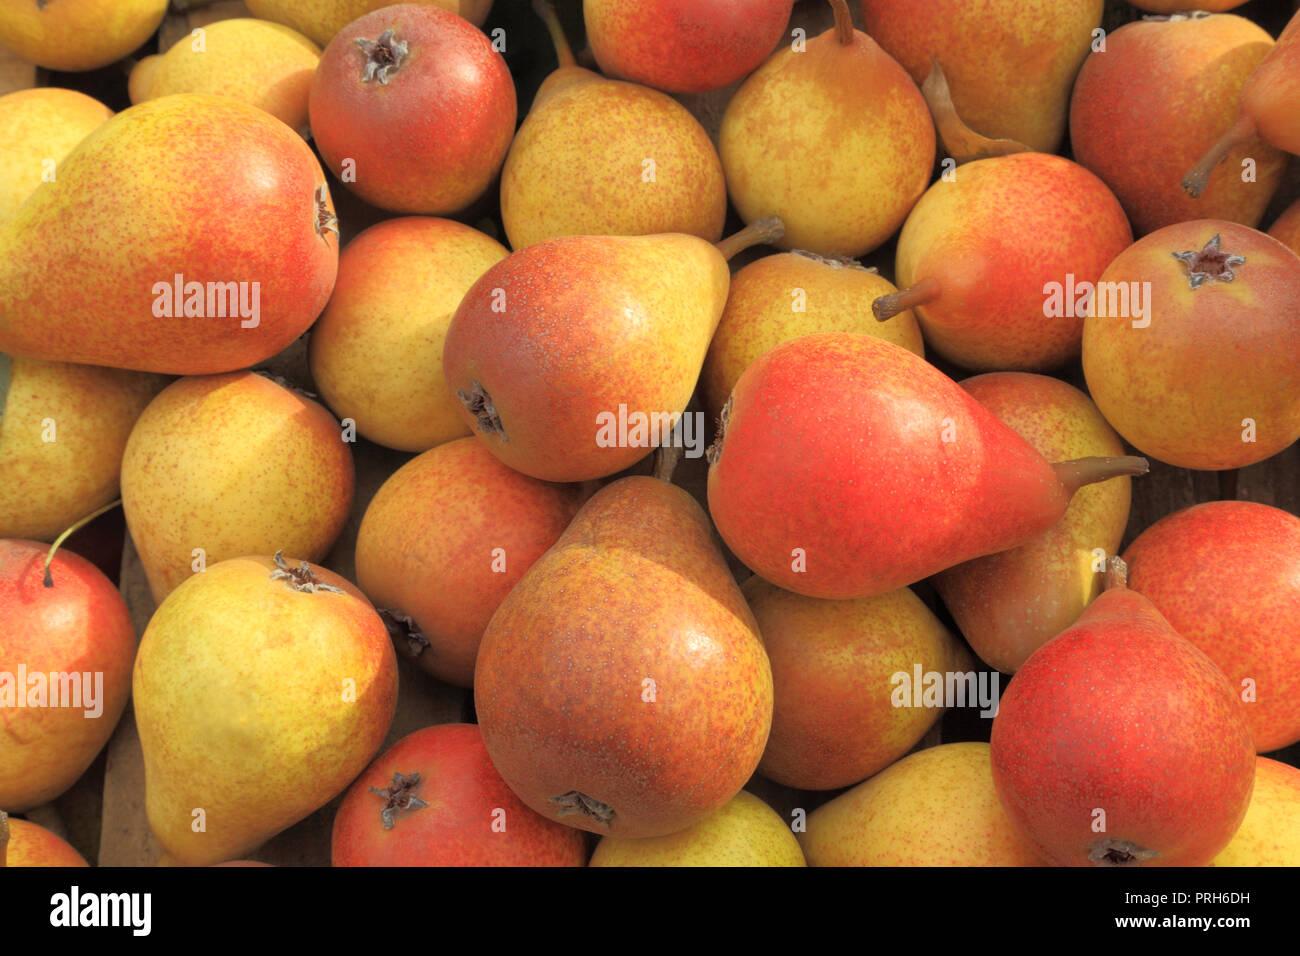 Pear, 'Robin', pears, pyrus, farm shop, display, edible, fruit - Stock Image